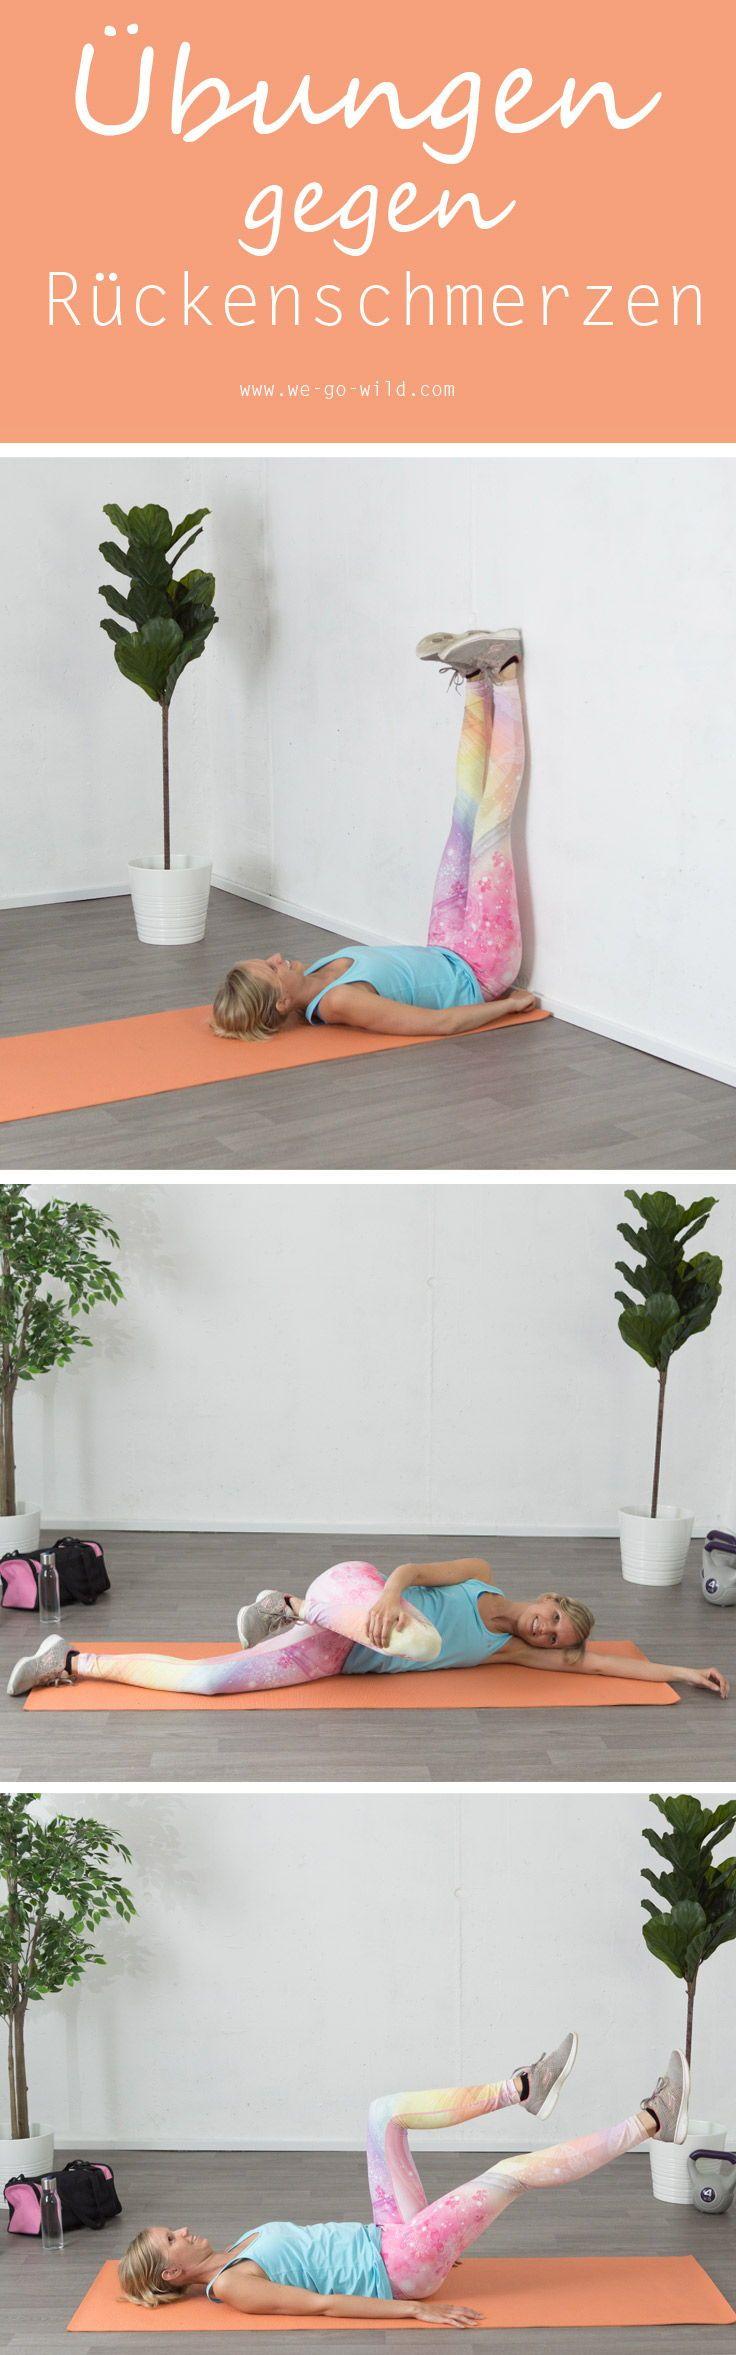 Badideen für frauen  best in bewegung images on pinterest  beleza body fitness and